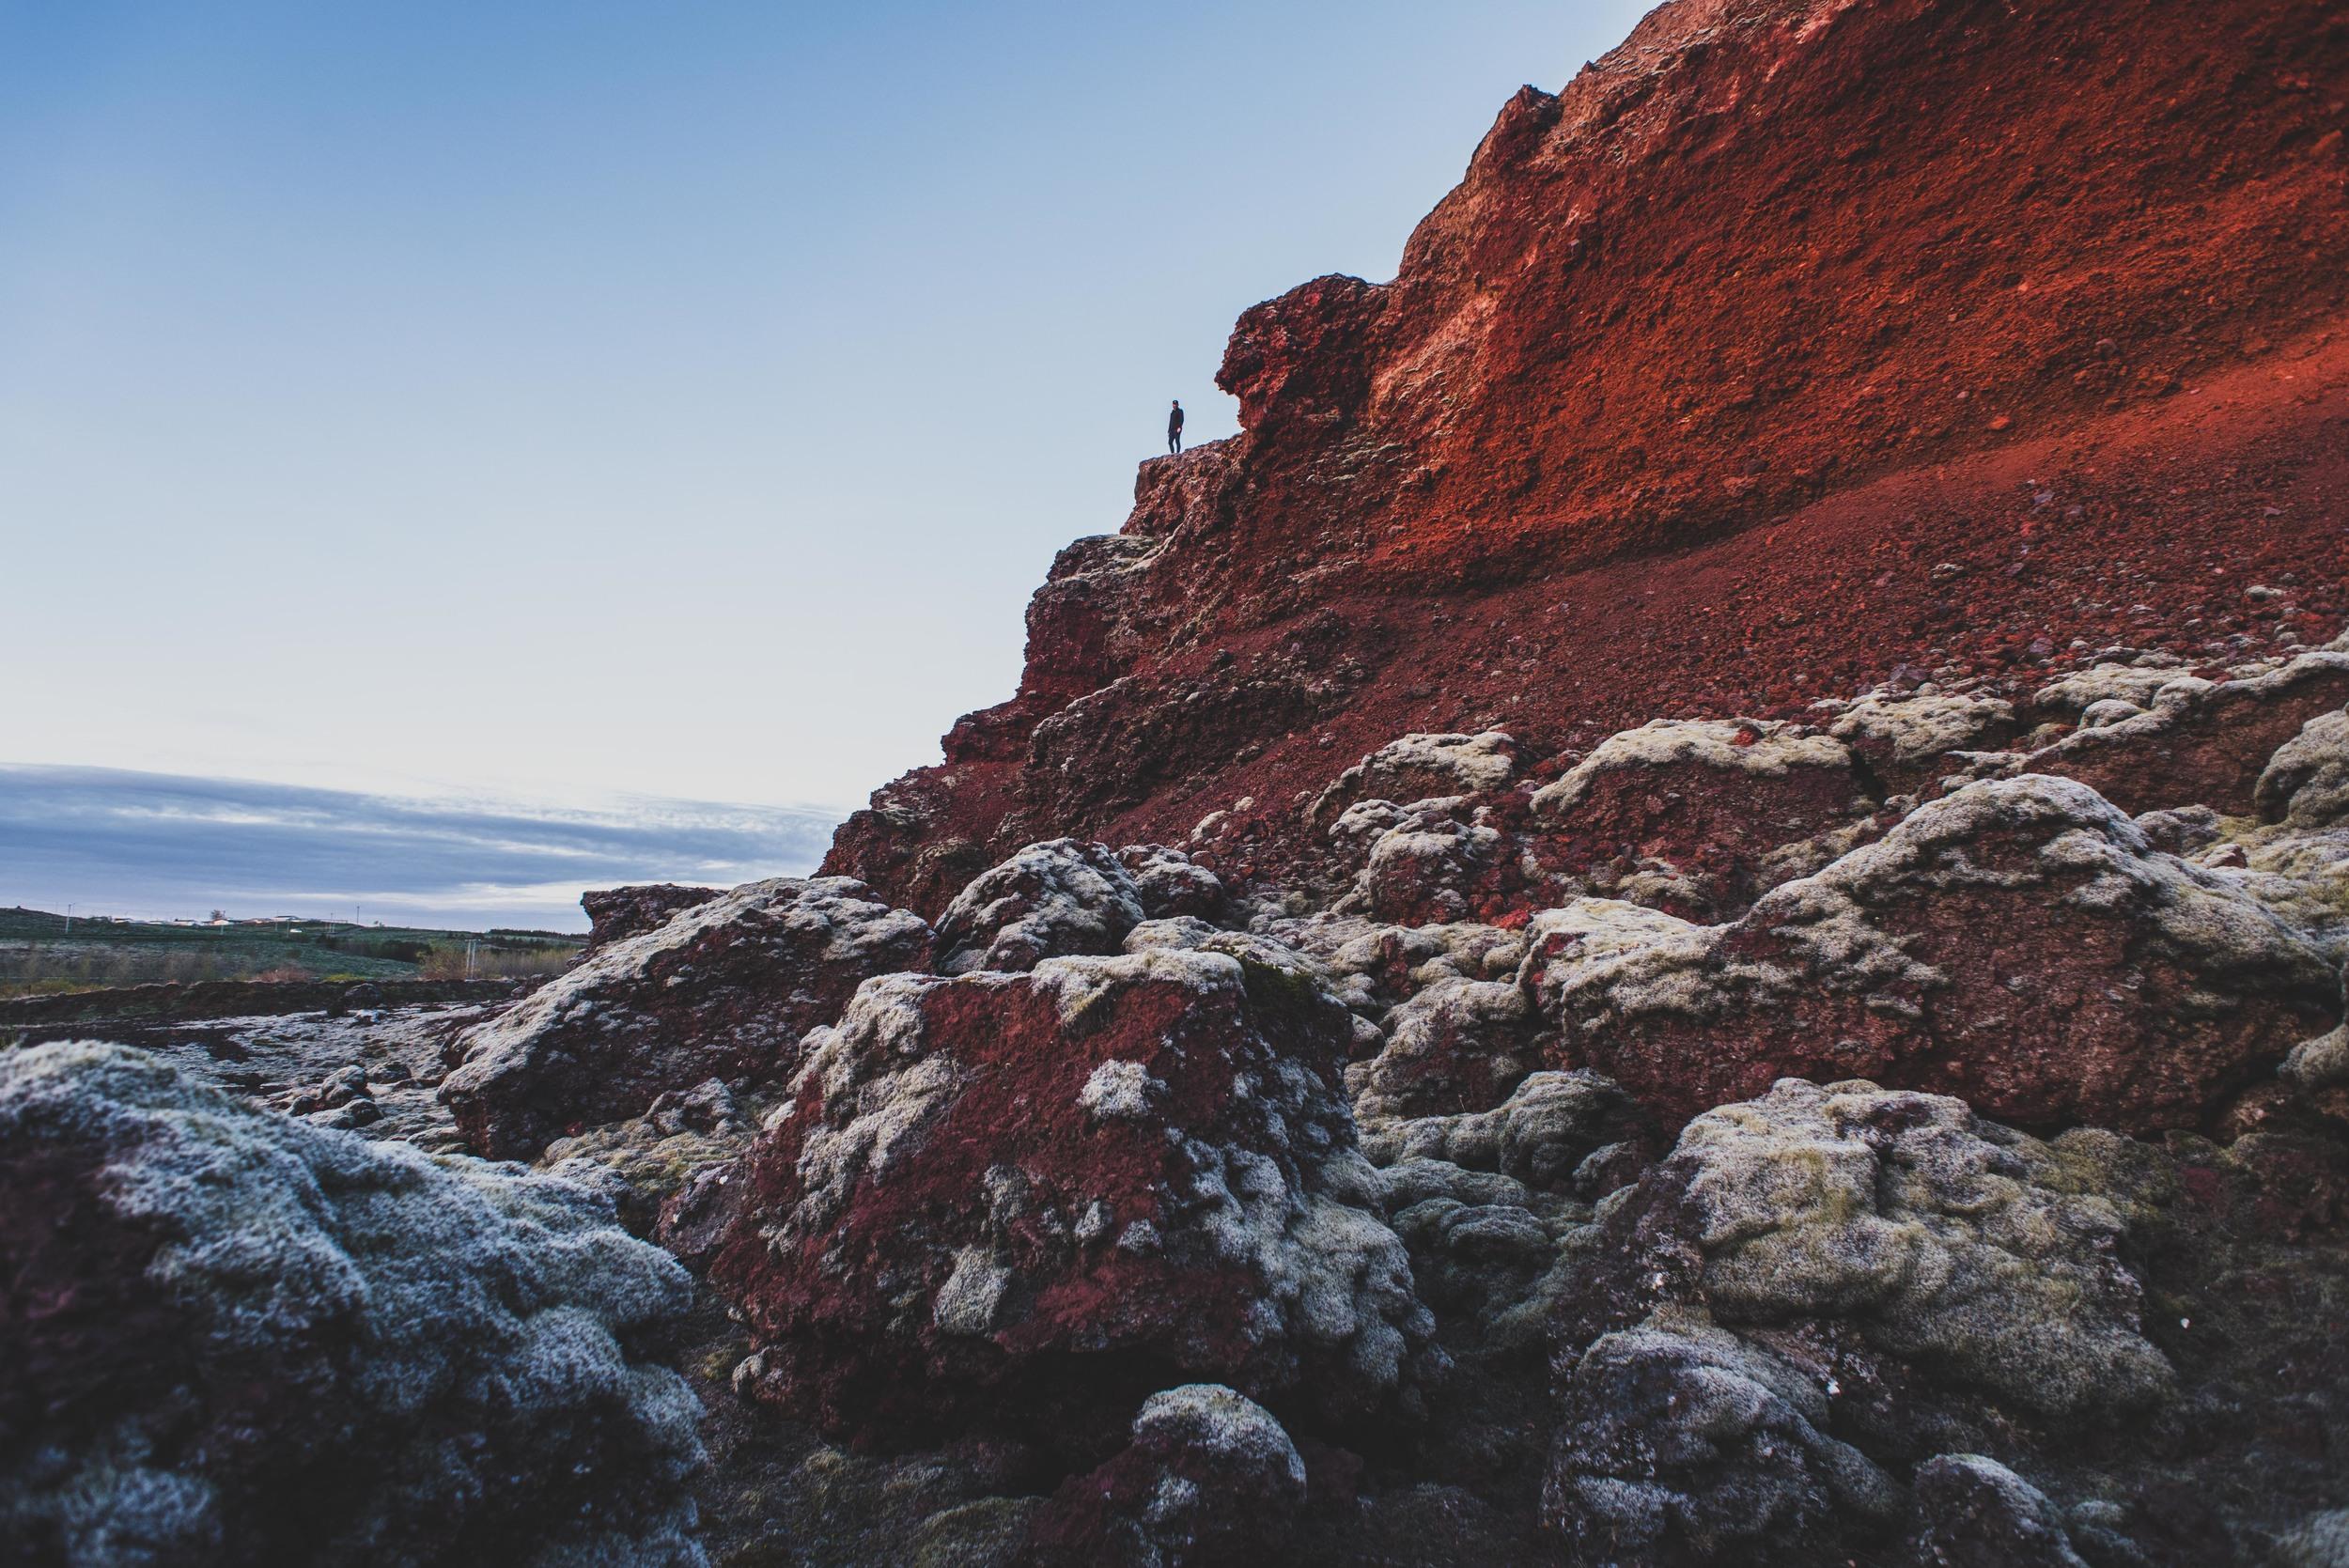 Joe Shutter Iceland Blogger Photographer Adventure-17.jpg